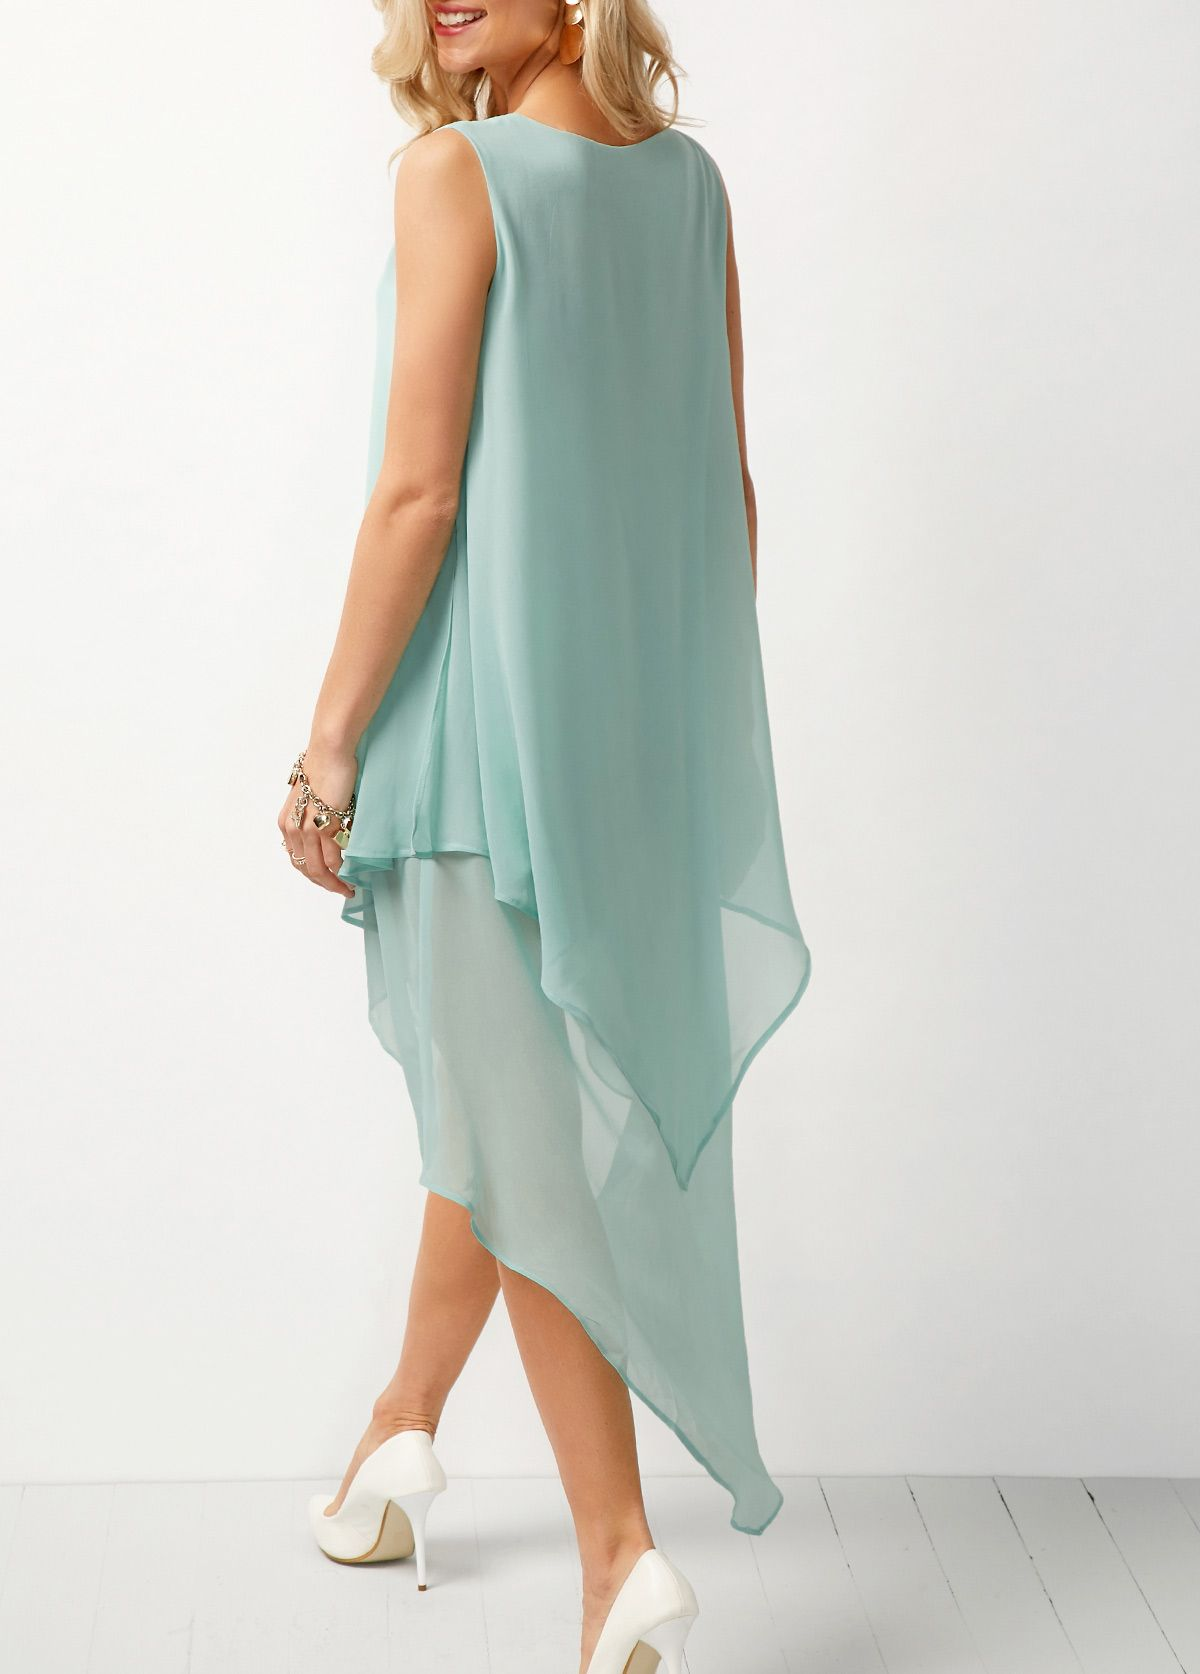 e10ef826b543 Sleeveless Asymmetric Hem Chiffon Overlay Tunic Dress #Hem, #Asymmetric,  #Sleeveless